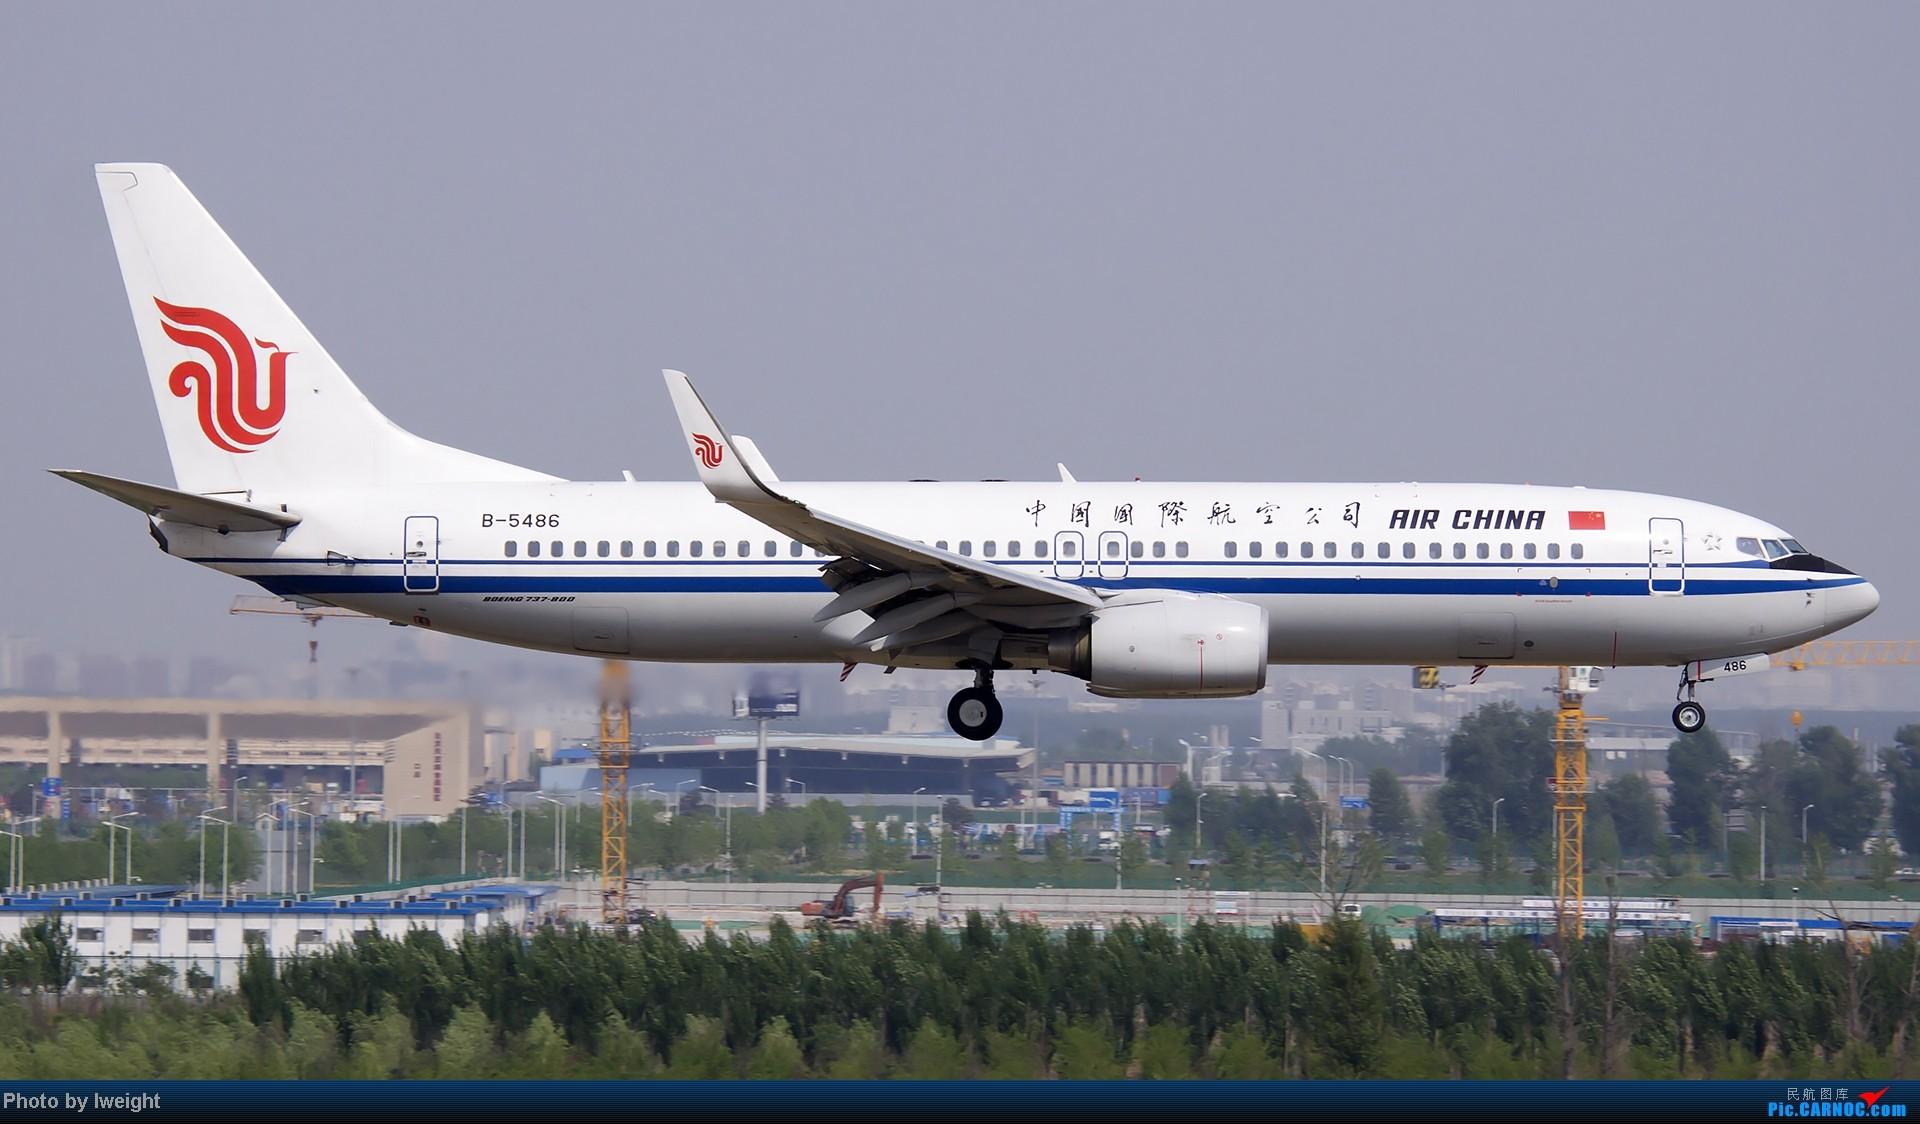 Re:[原创]错过了卡航的巴塞罗那号,只有这些大路货了,泪奔啊 BOEING 737-800 B-5486 中国北京首都机场